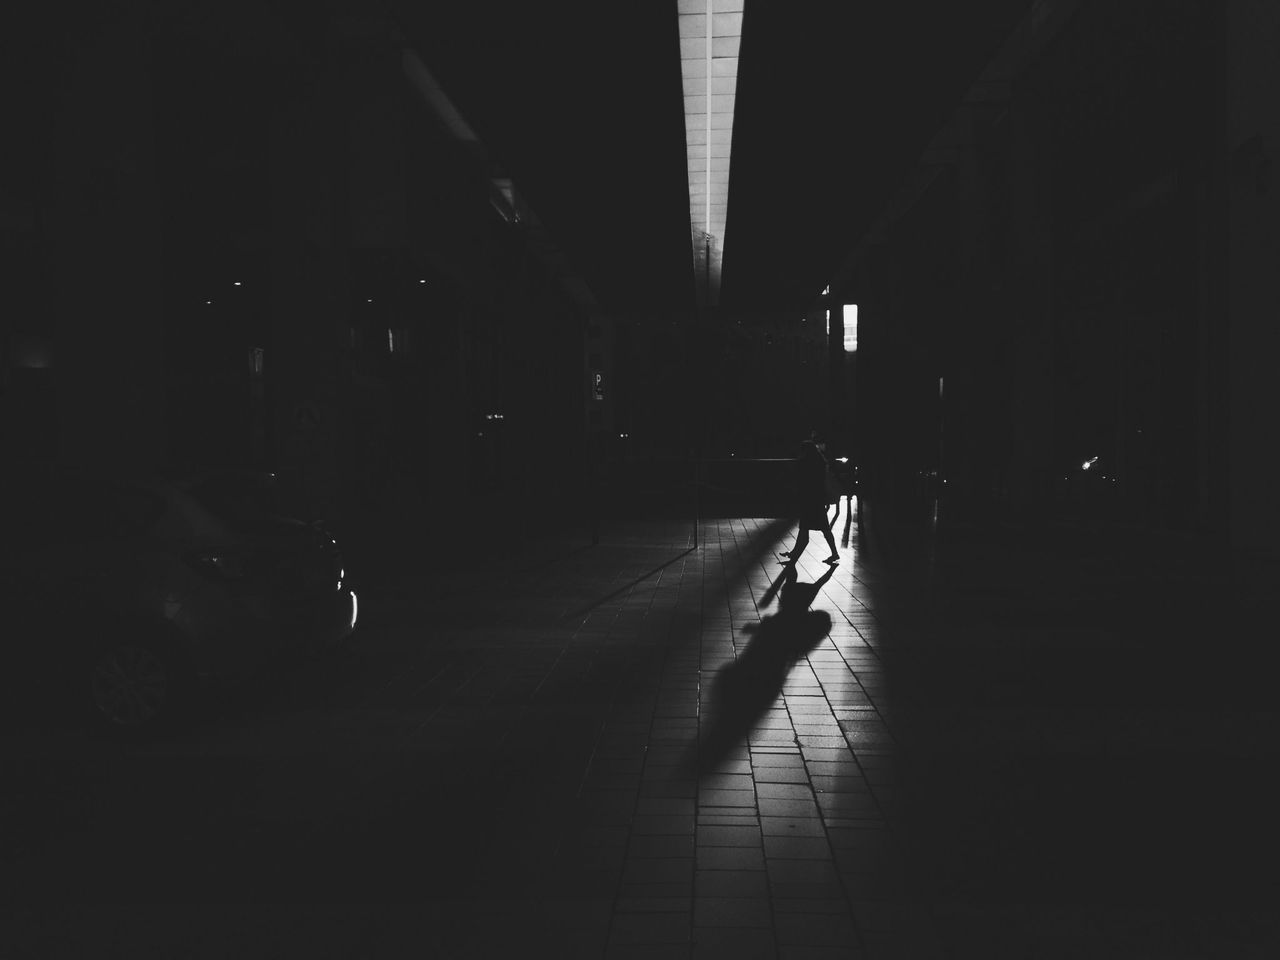 #melbourne #shadows